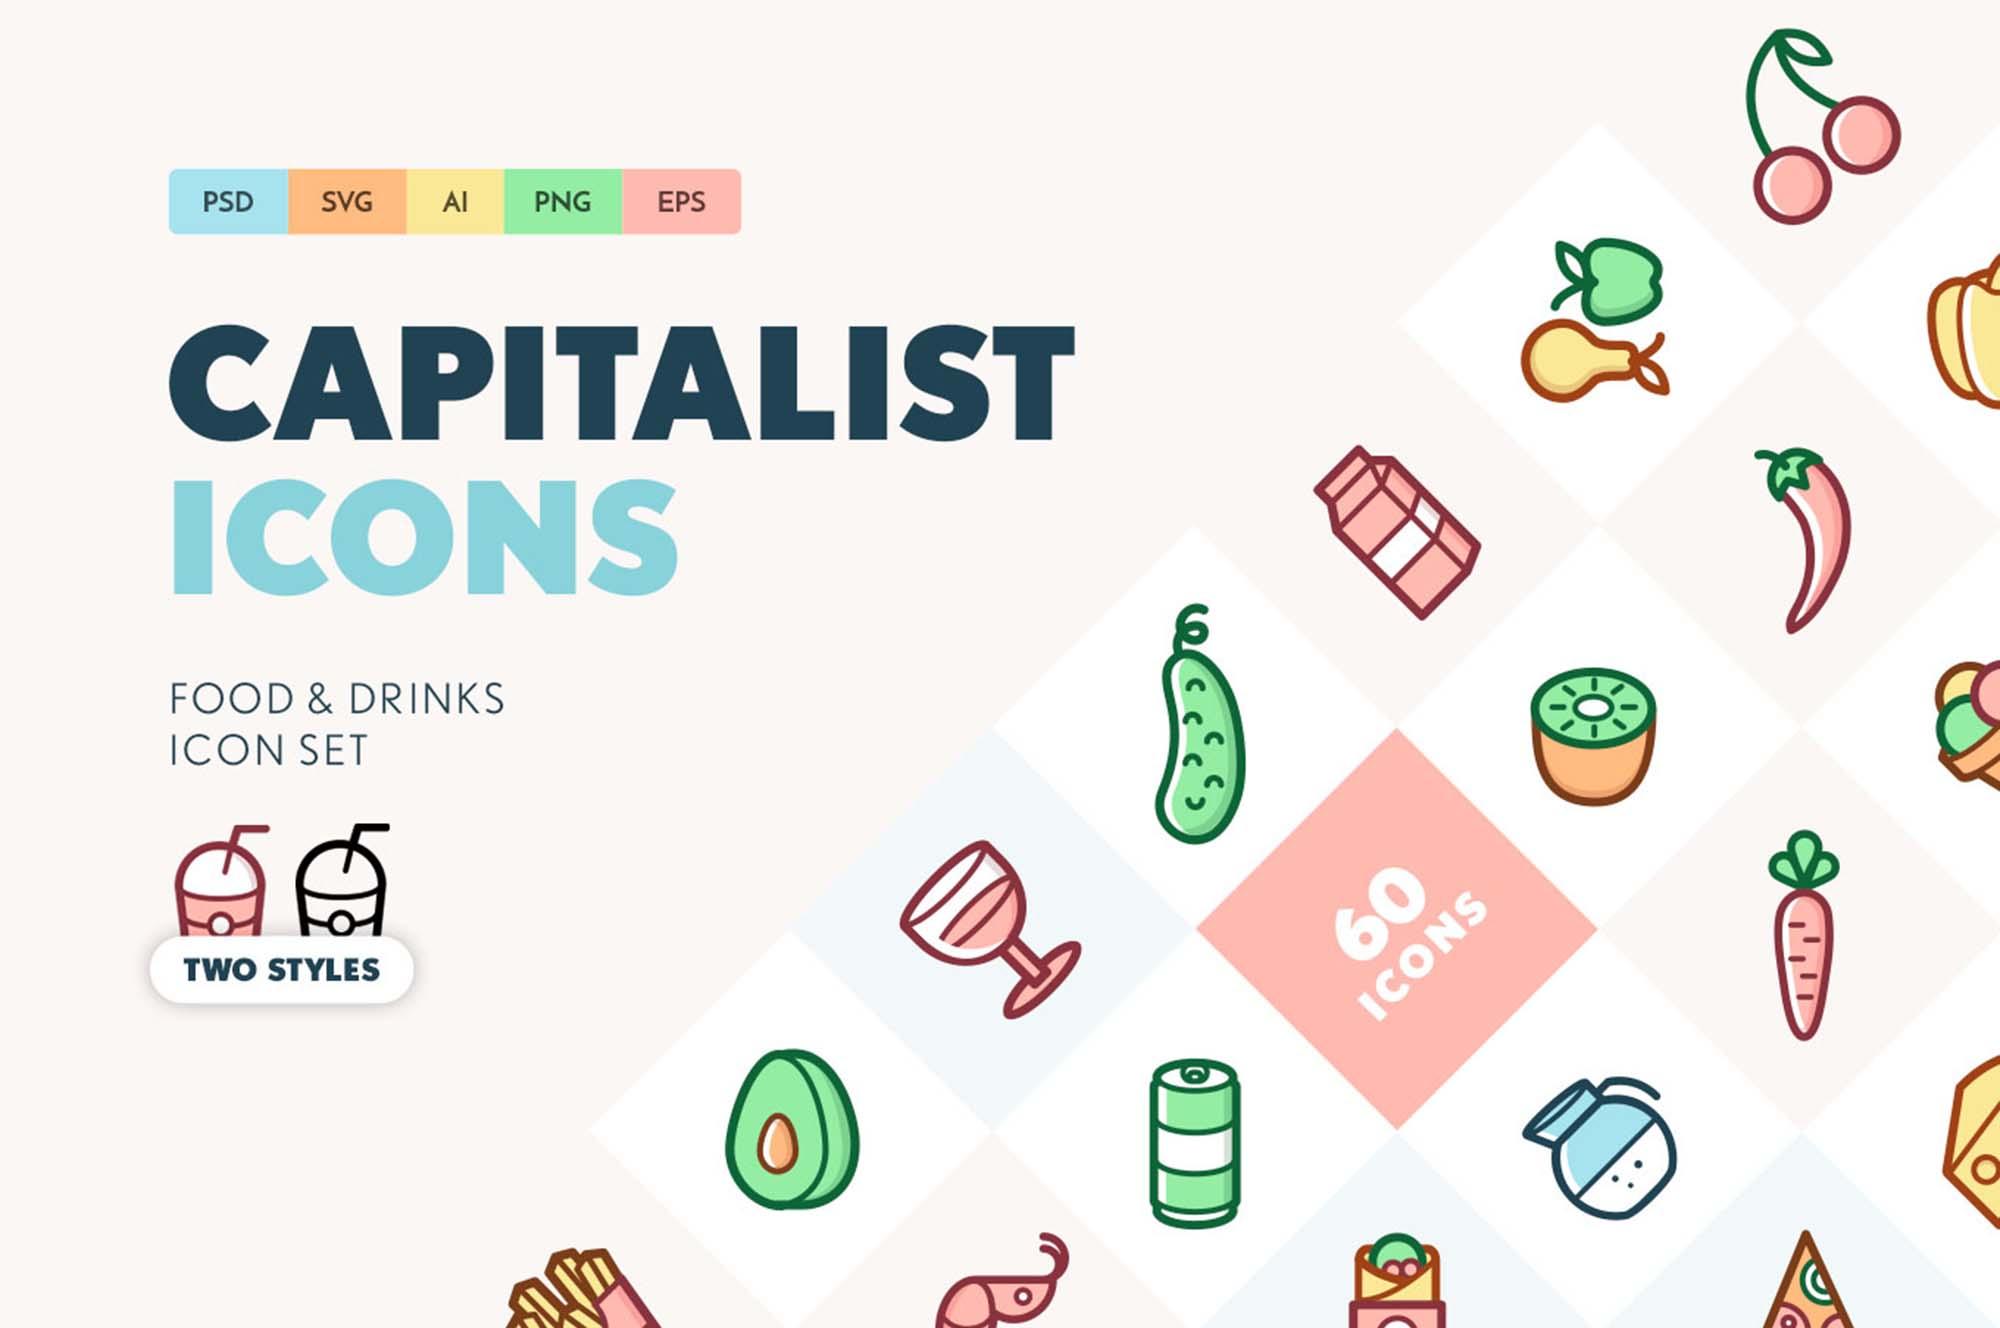 Food & Drinks Icons